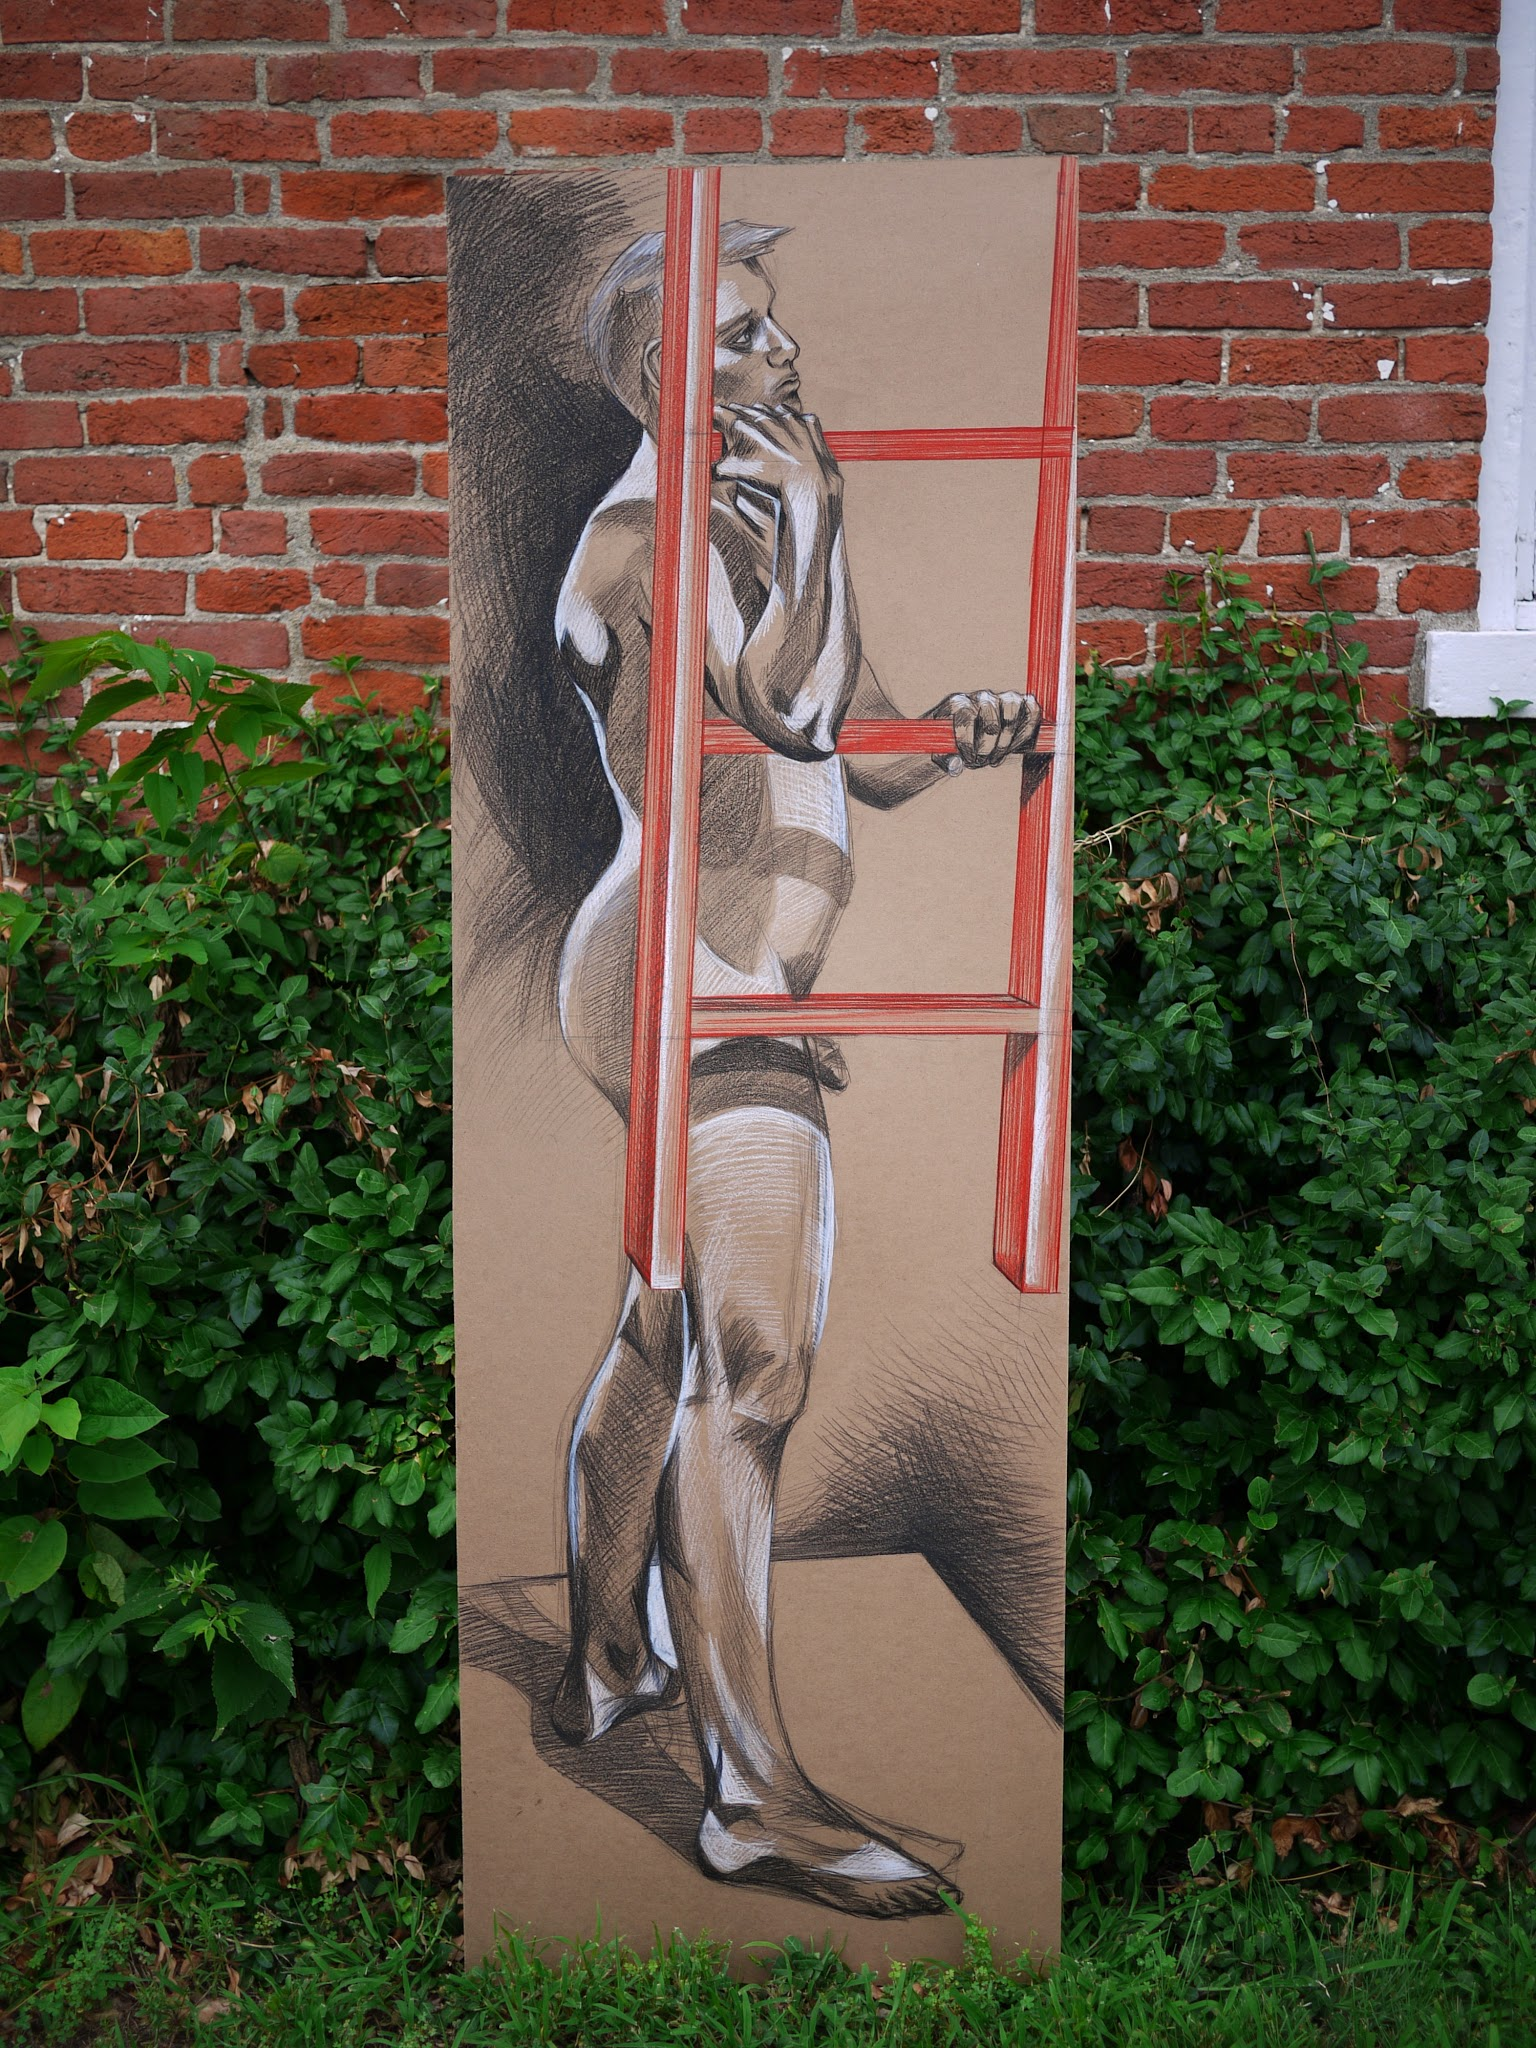 Man with Ladder , 2009 china marker on masonite panel (6' x 2.5')